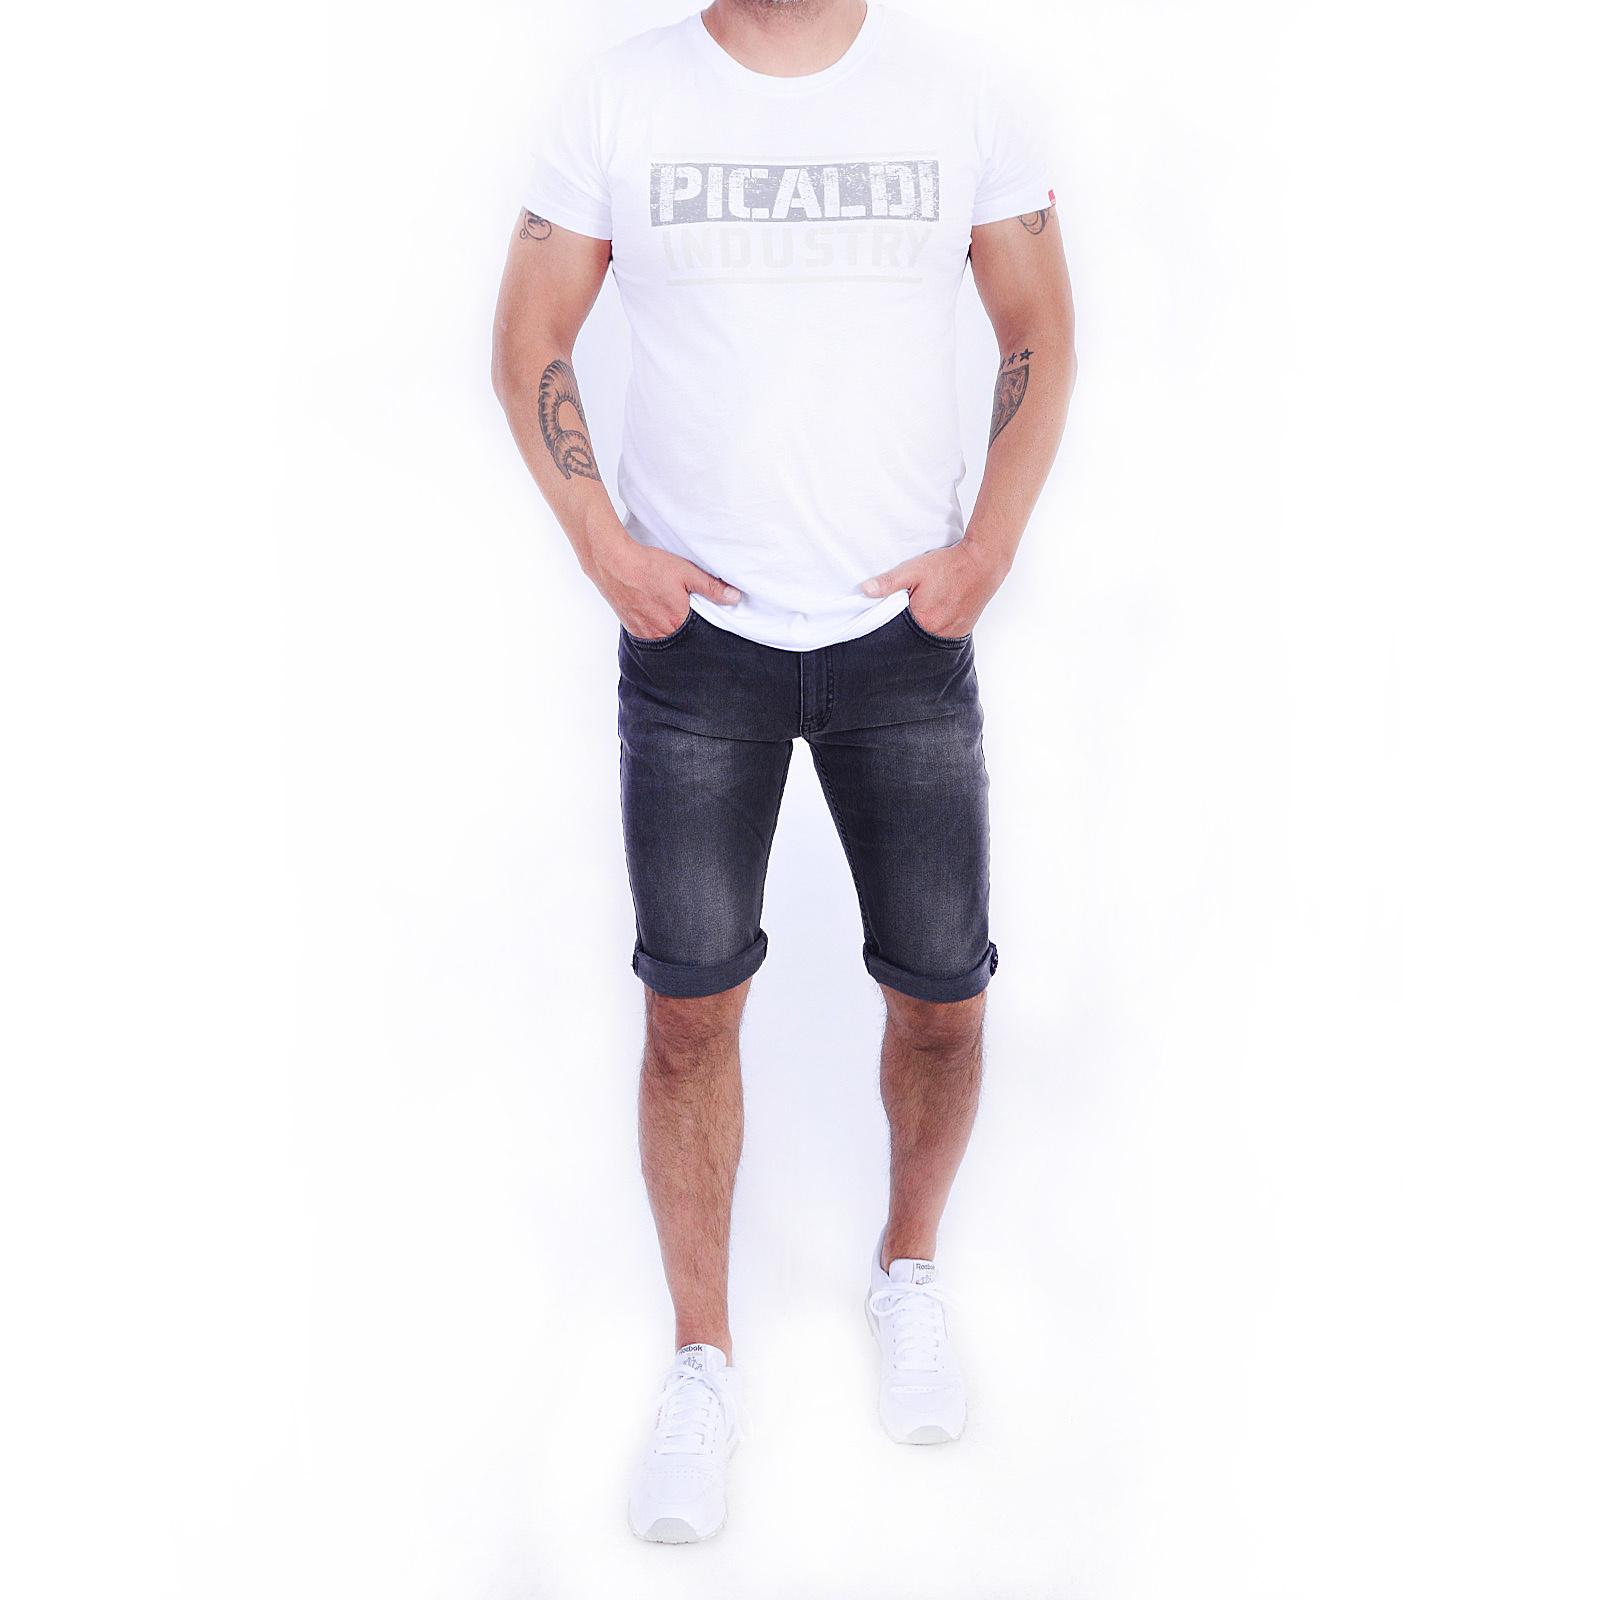 Picaldi Denim Short 103